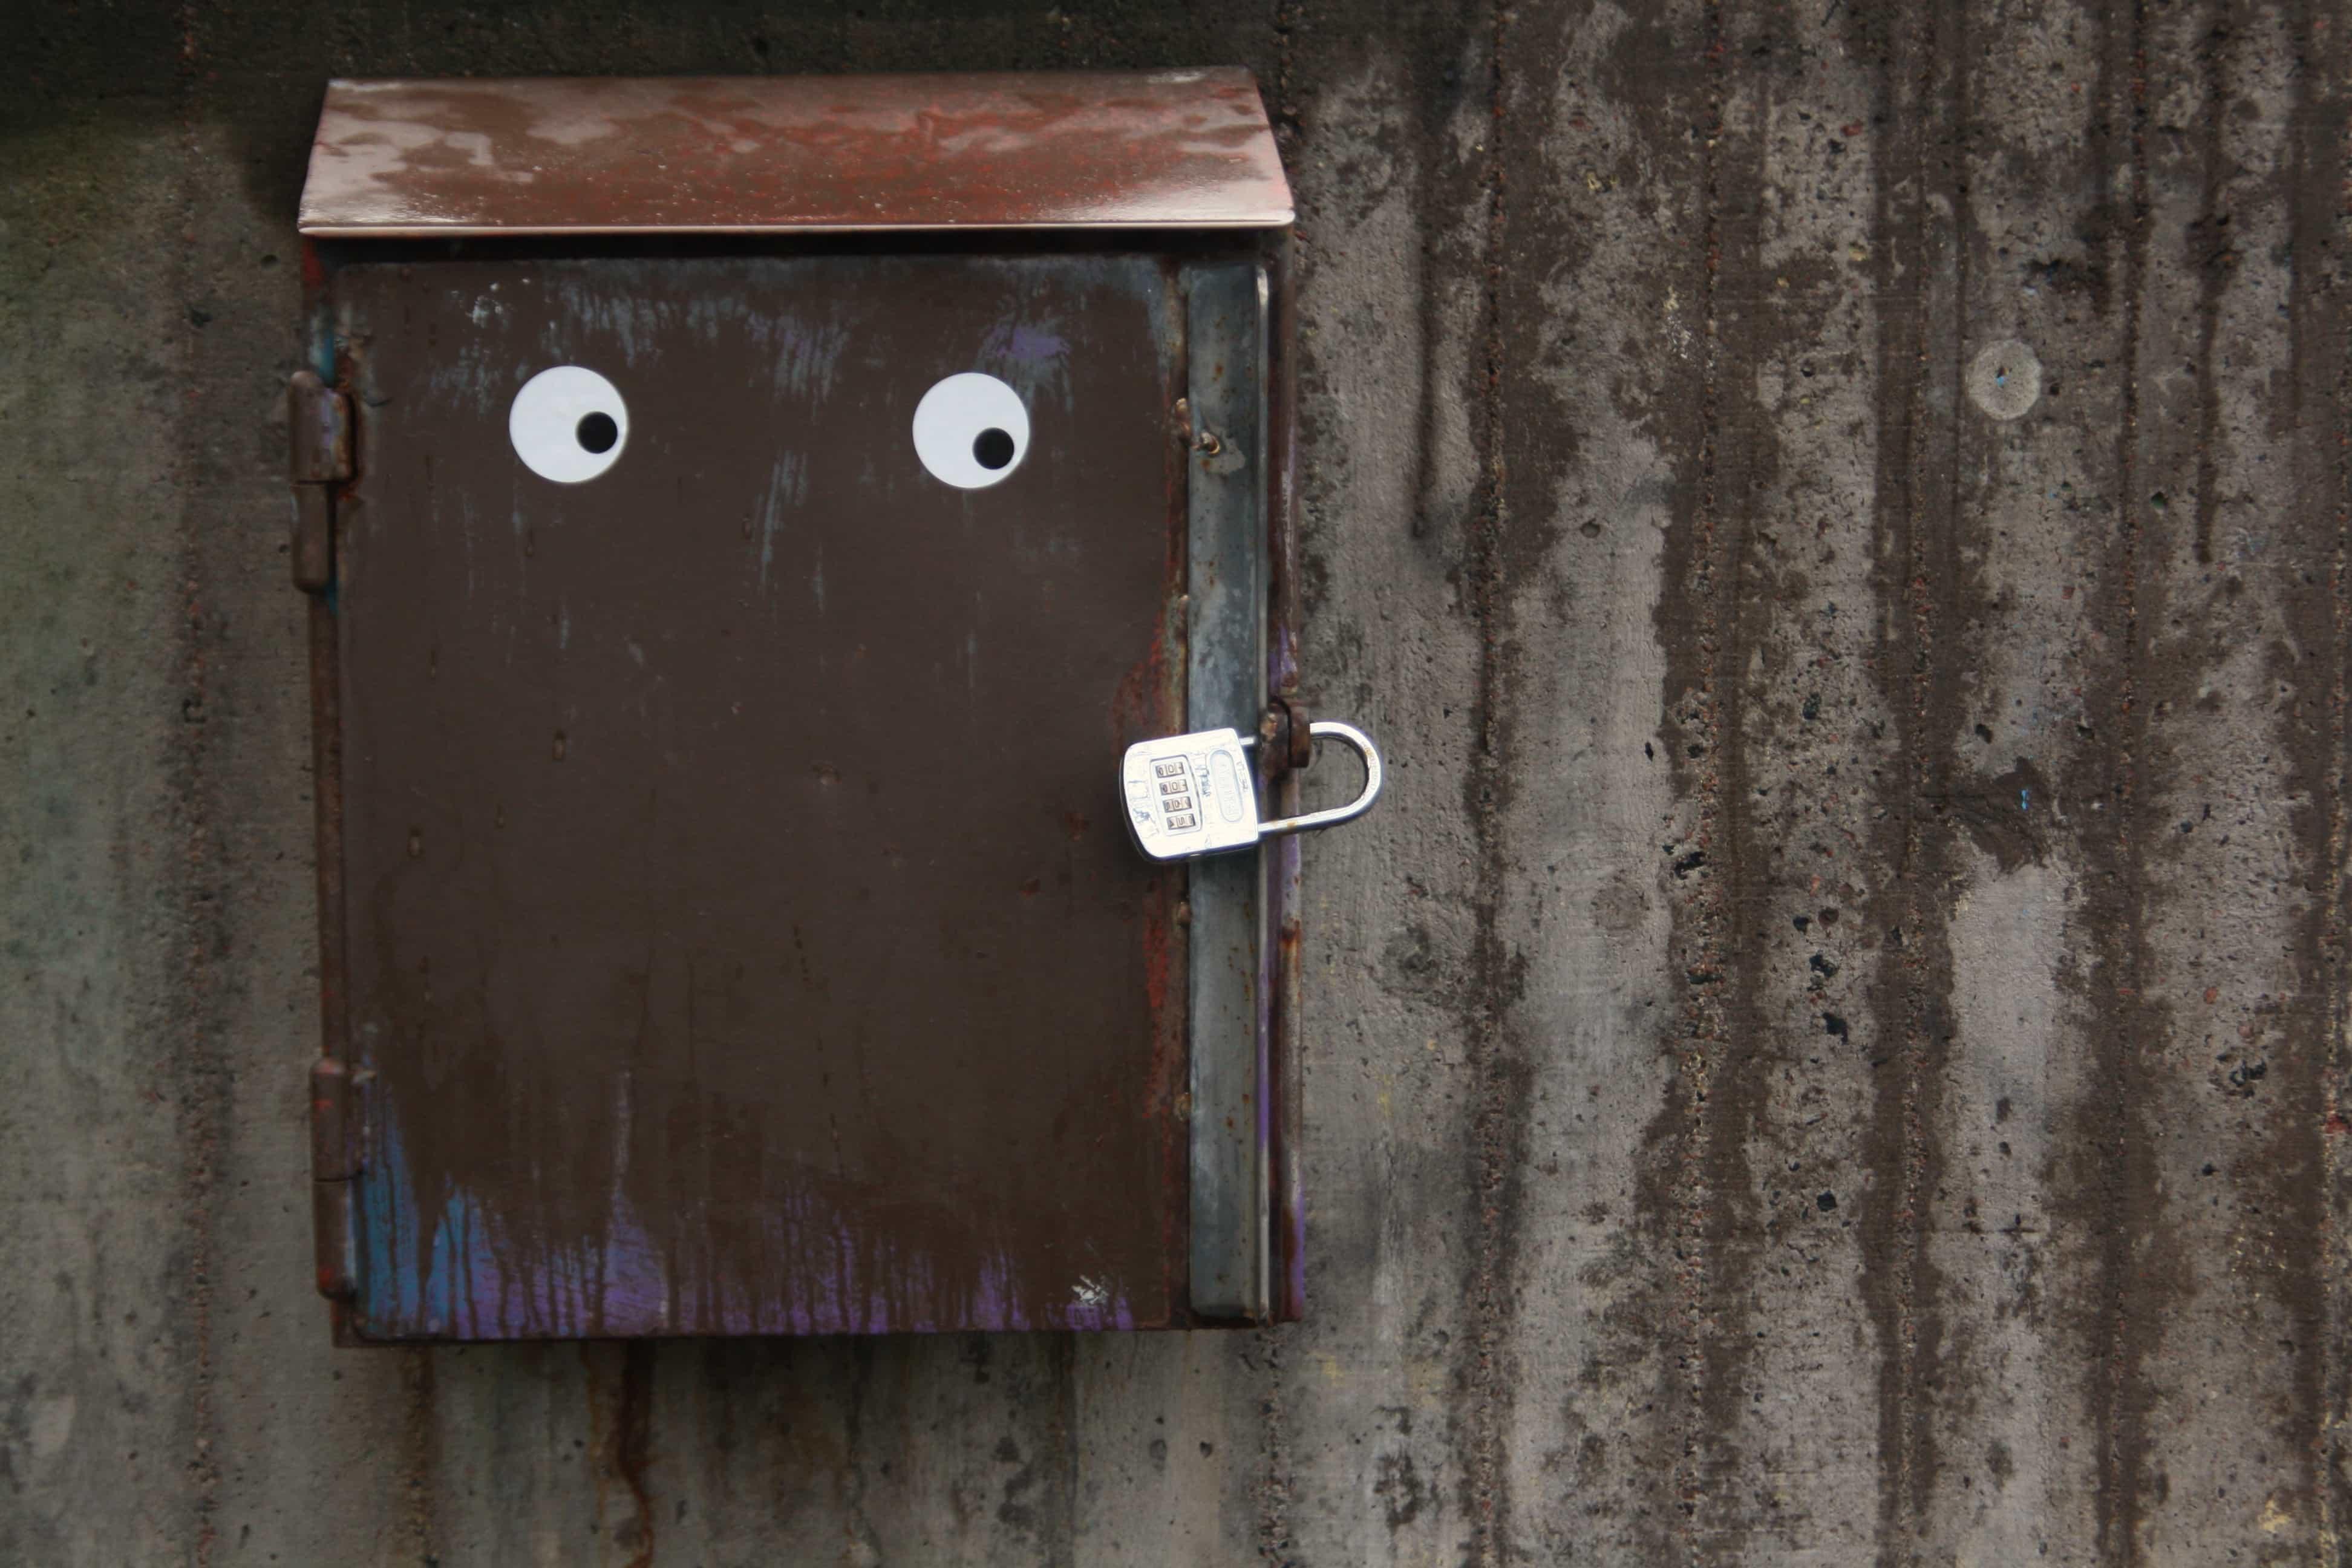 Dropbox padlock